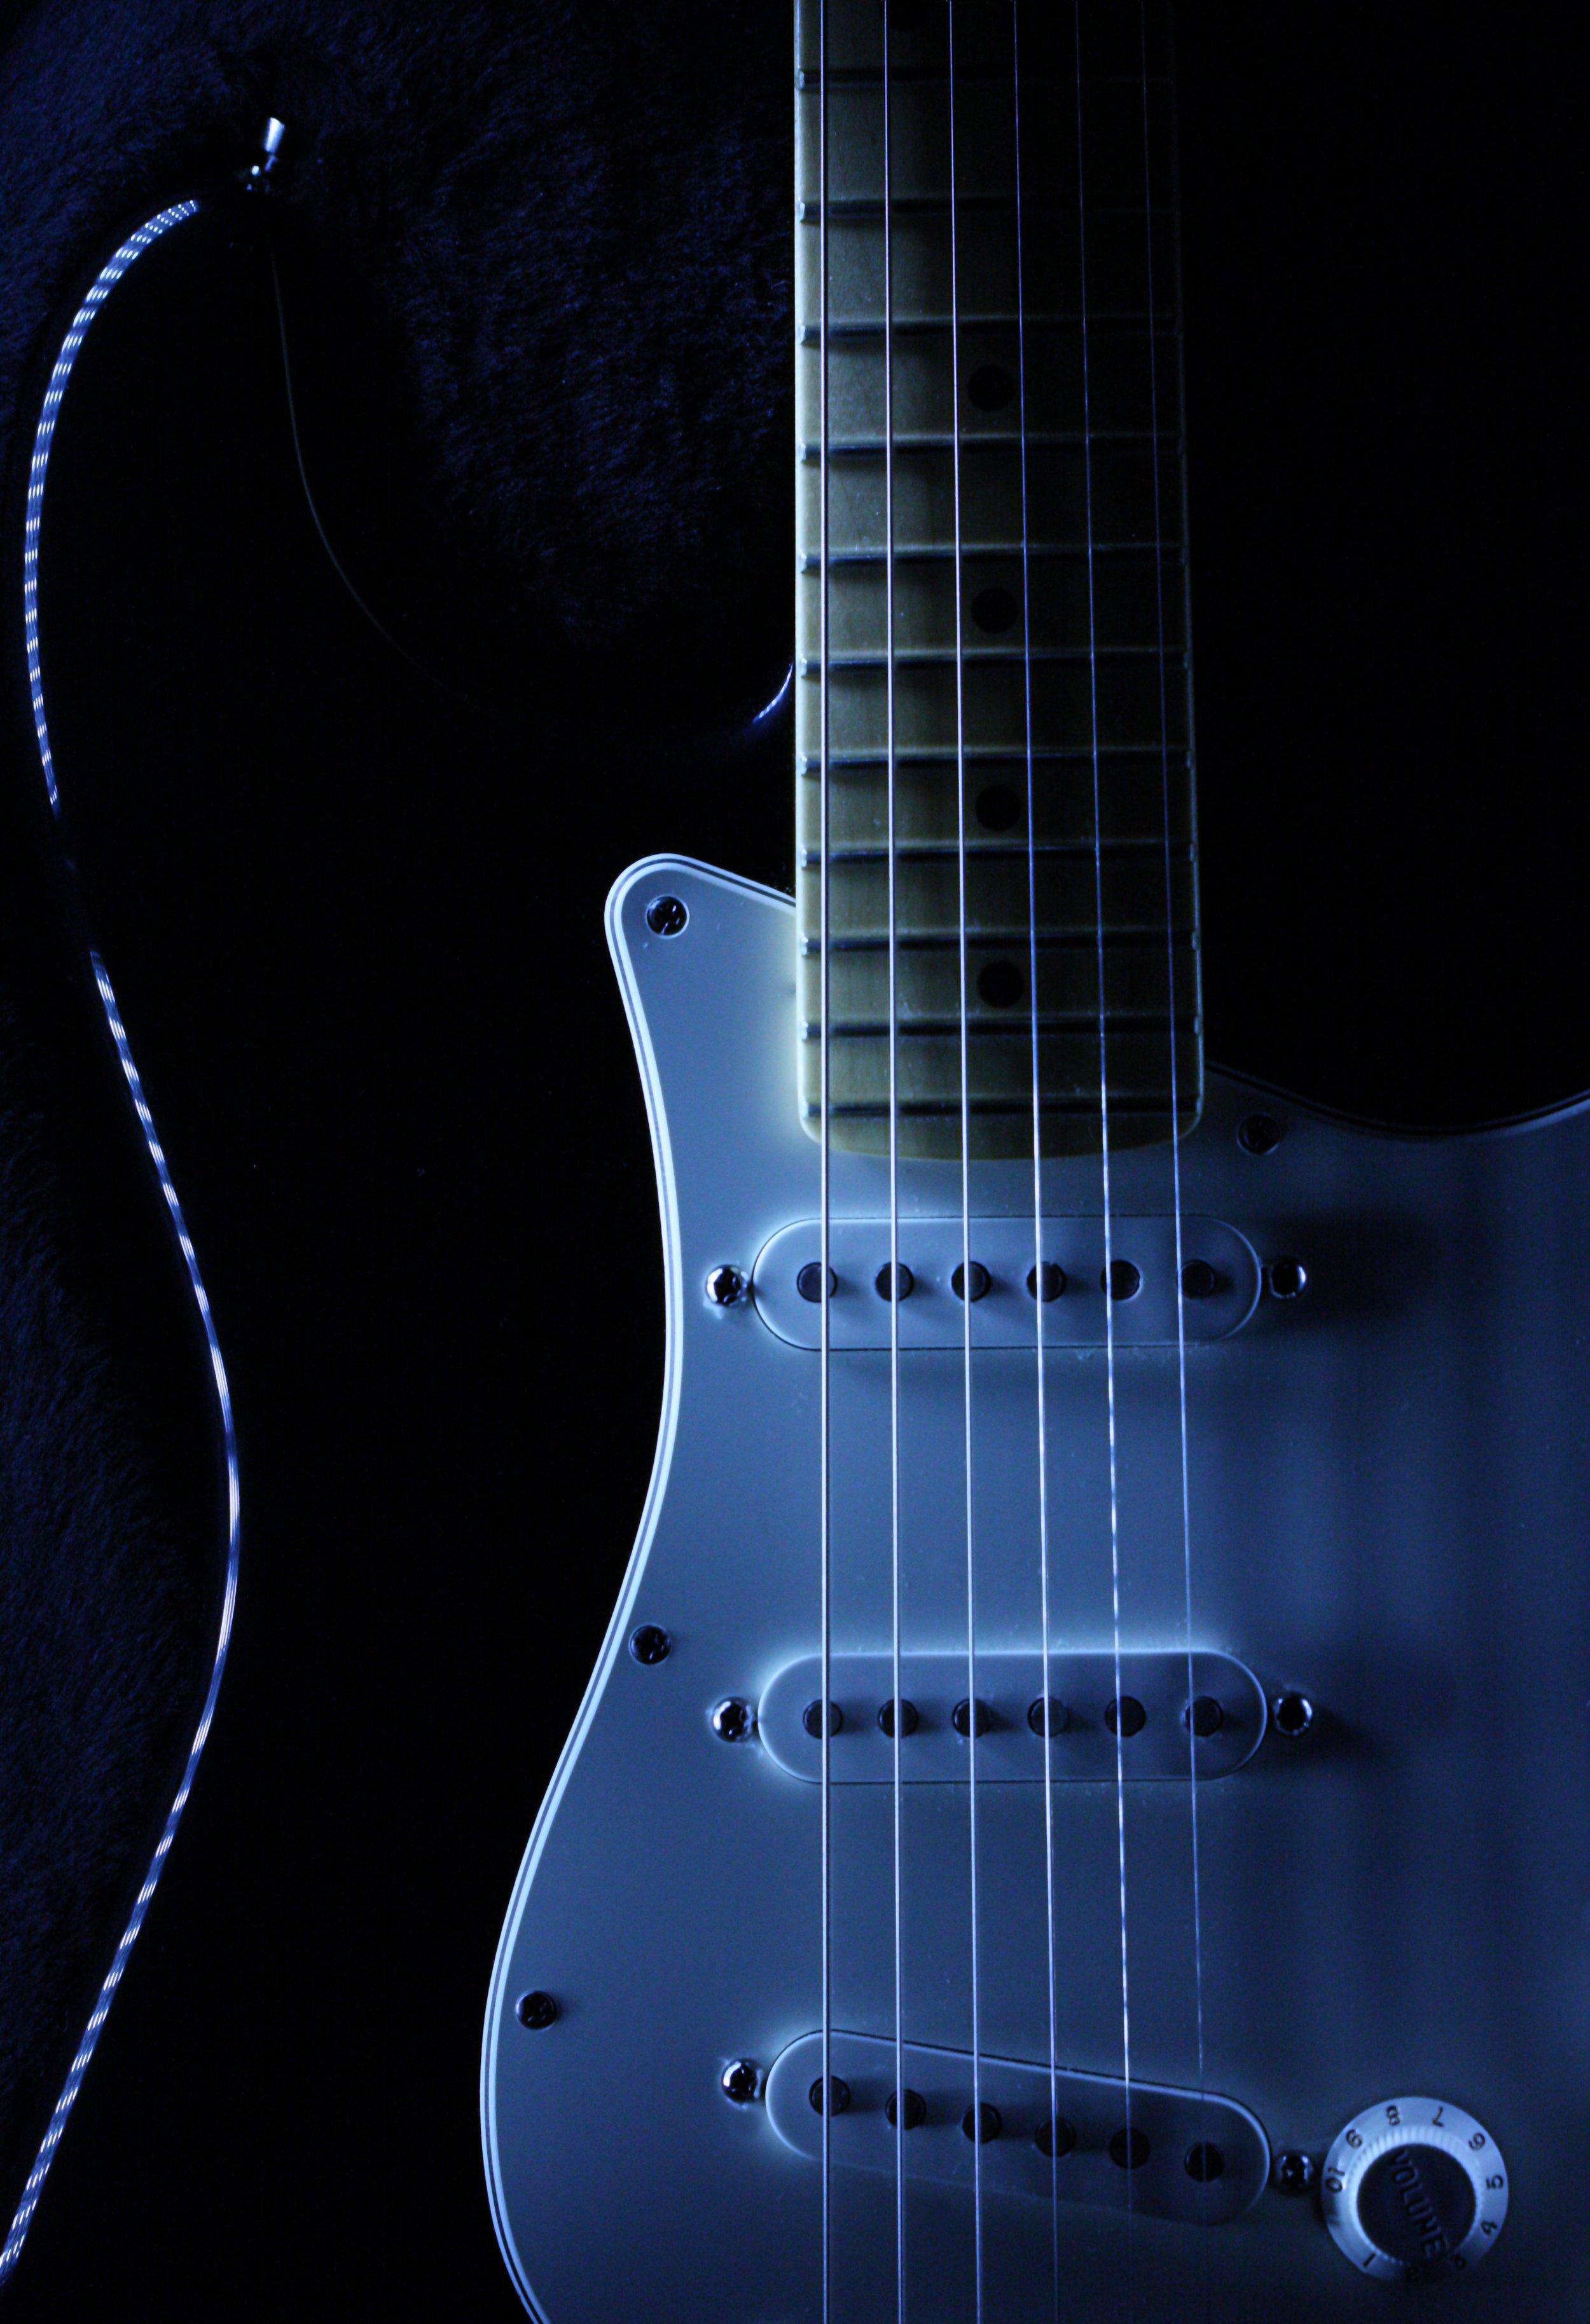 blues guitar.jpg